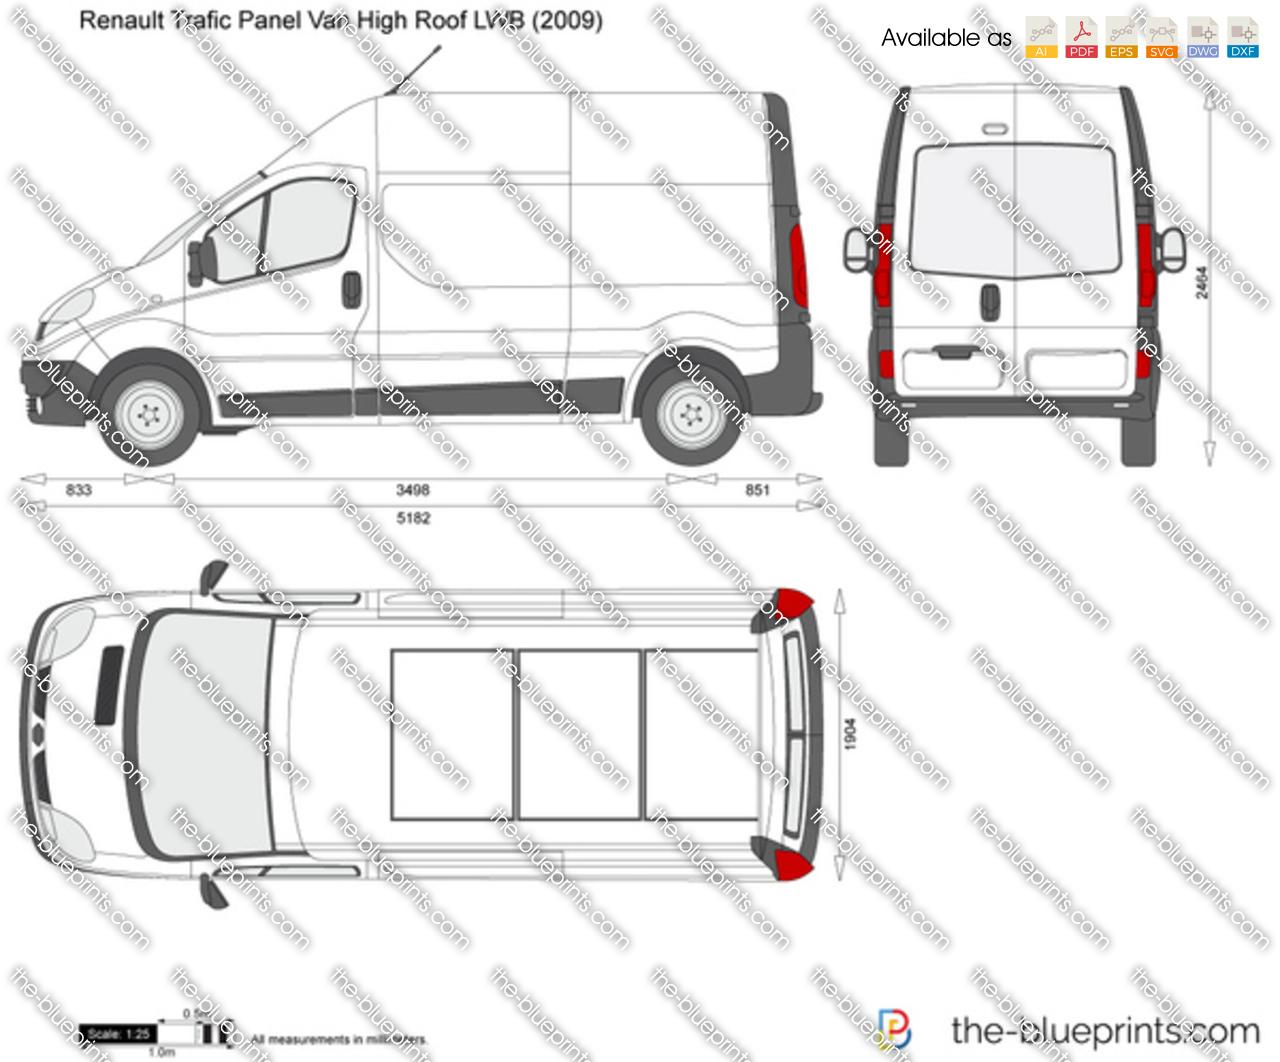 renault trafic panel van high roof lwb vector drawing